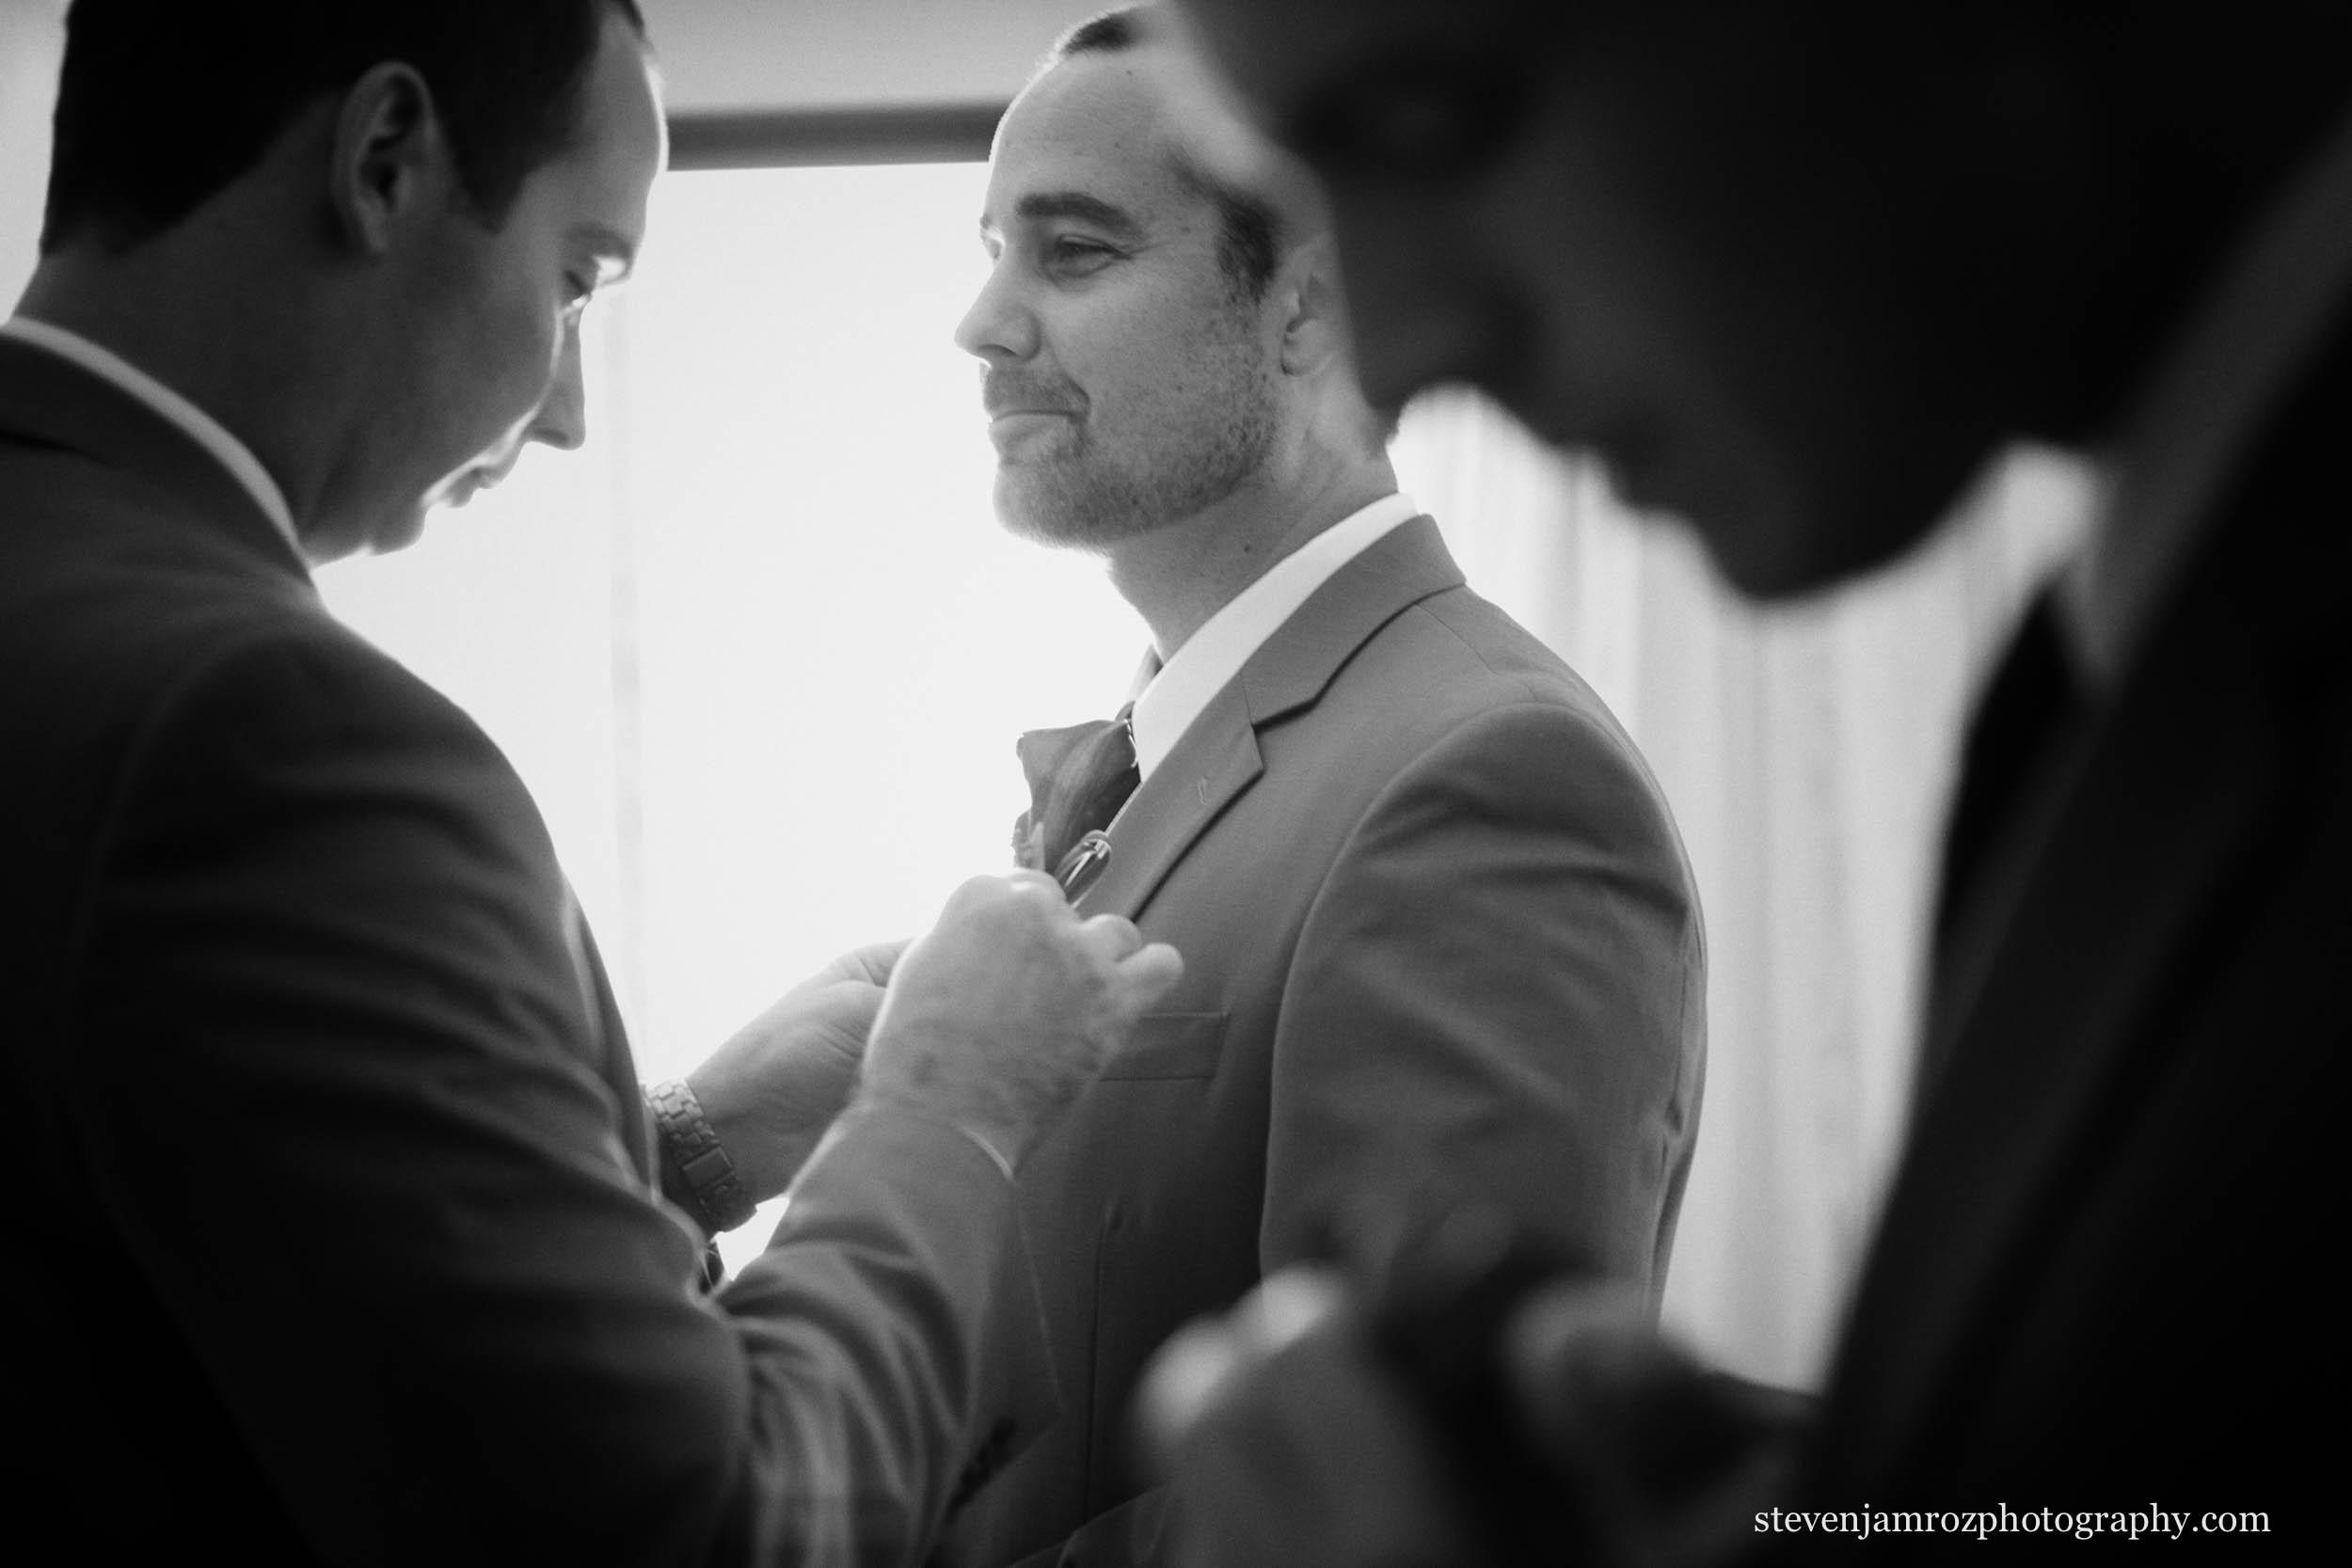 pining-boutoneer-groomsman-steven-jamroz-photography-0485.jpg